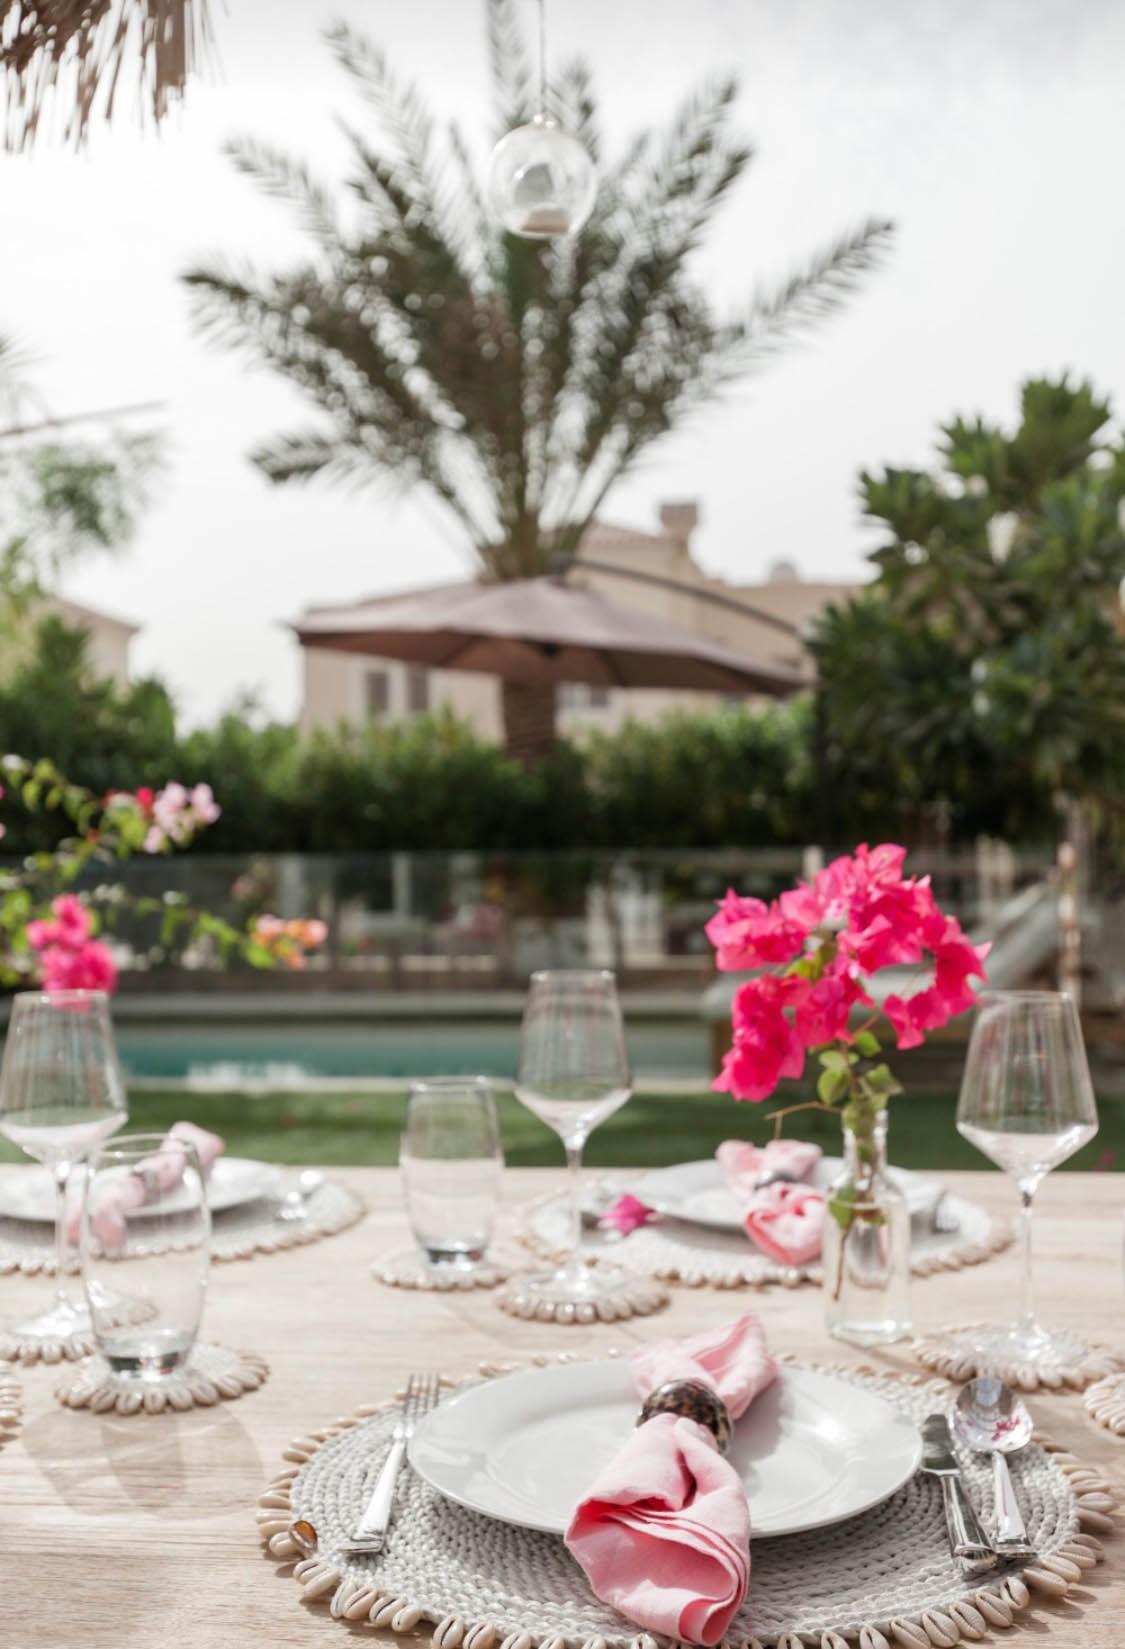 Villa at Ghadeer